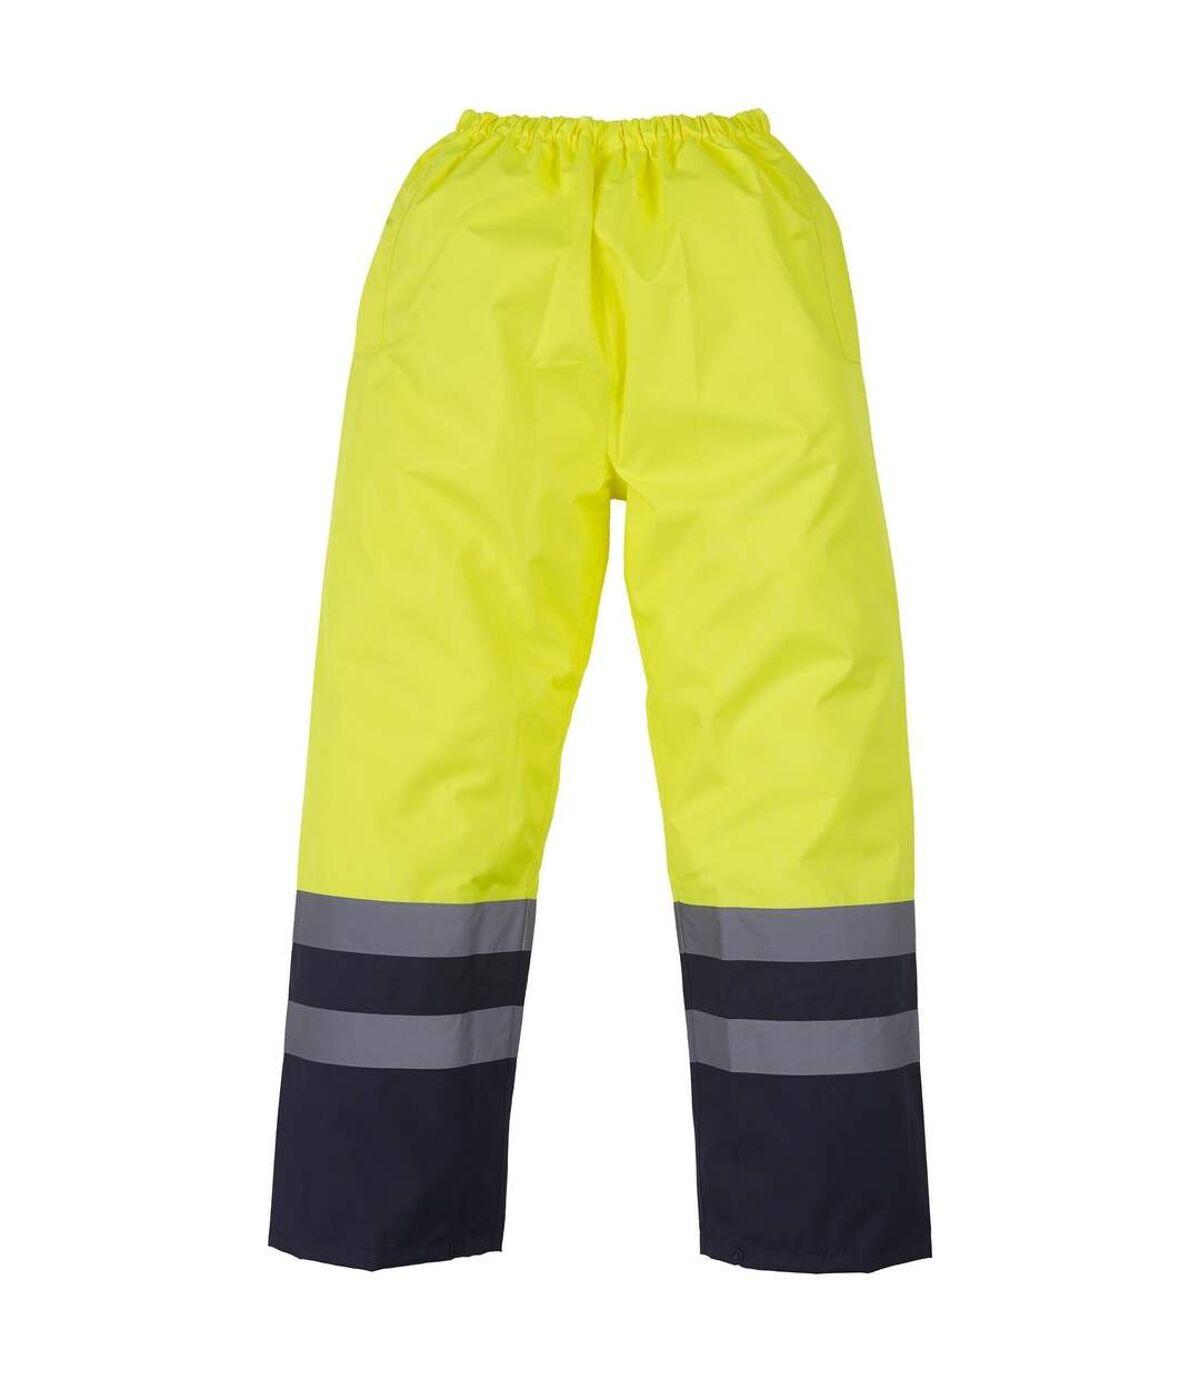 Yoko Mens Hi Vis Waterproof Overtrousers (Pack of 2) (Yellow/ Navy) - UTRW6888